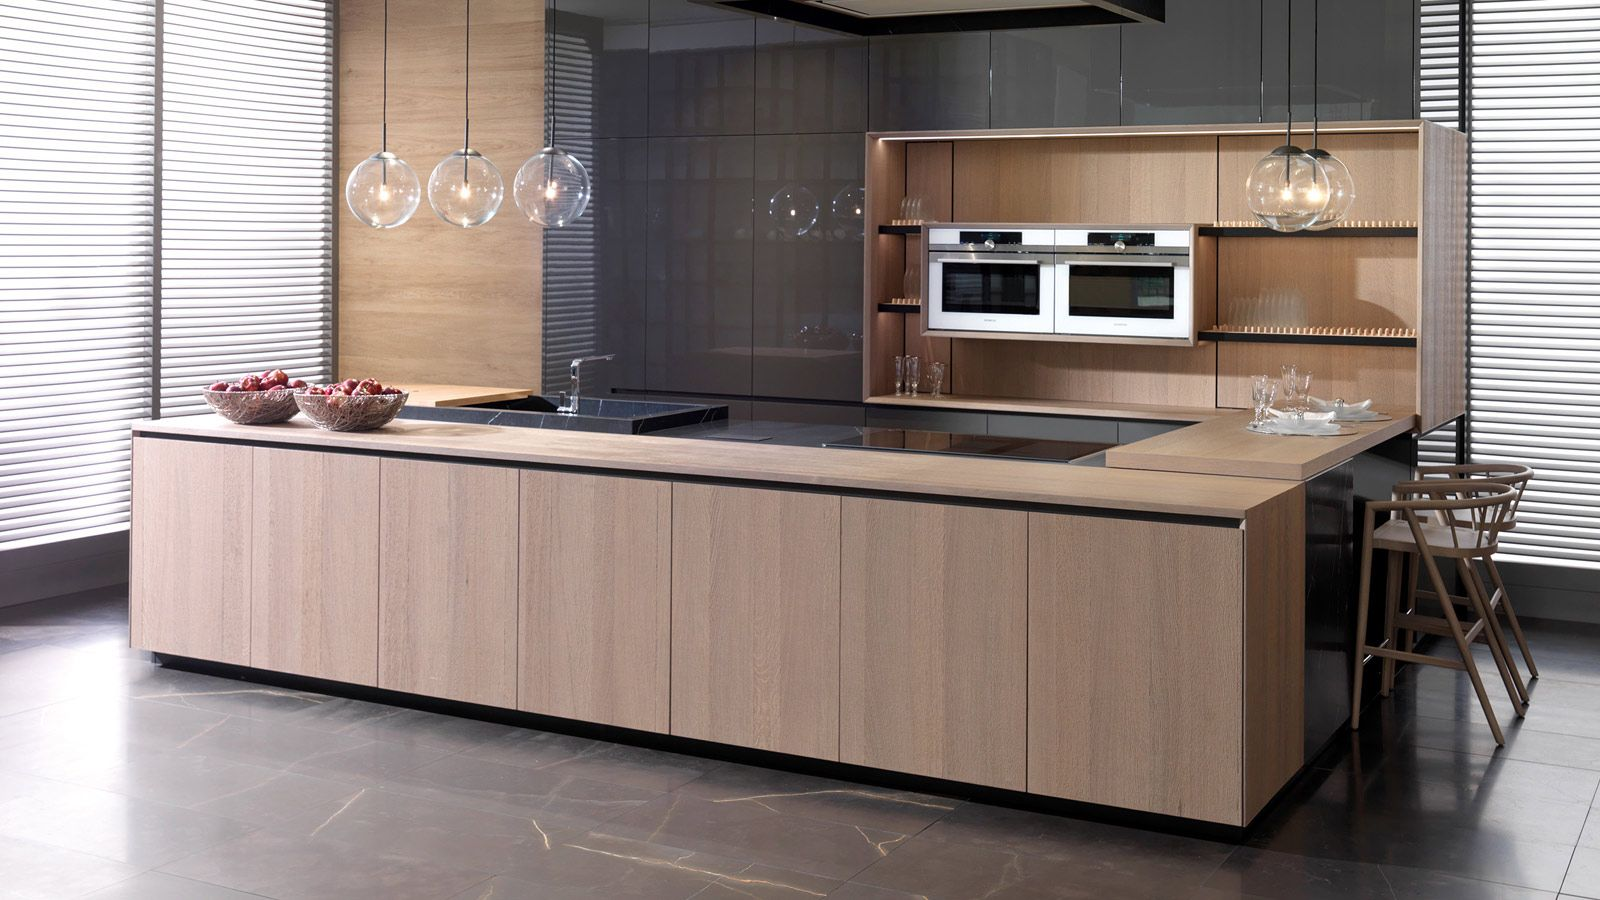 Gamadecor Kitchens Quality Guaranteed Porcelanosa Trendbook In 2020 Interior Design Kitchen Kitchen Peninsula Kitchen Design